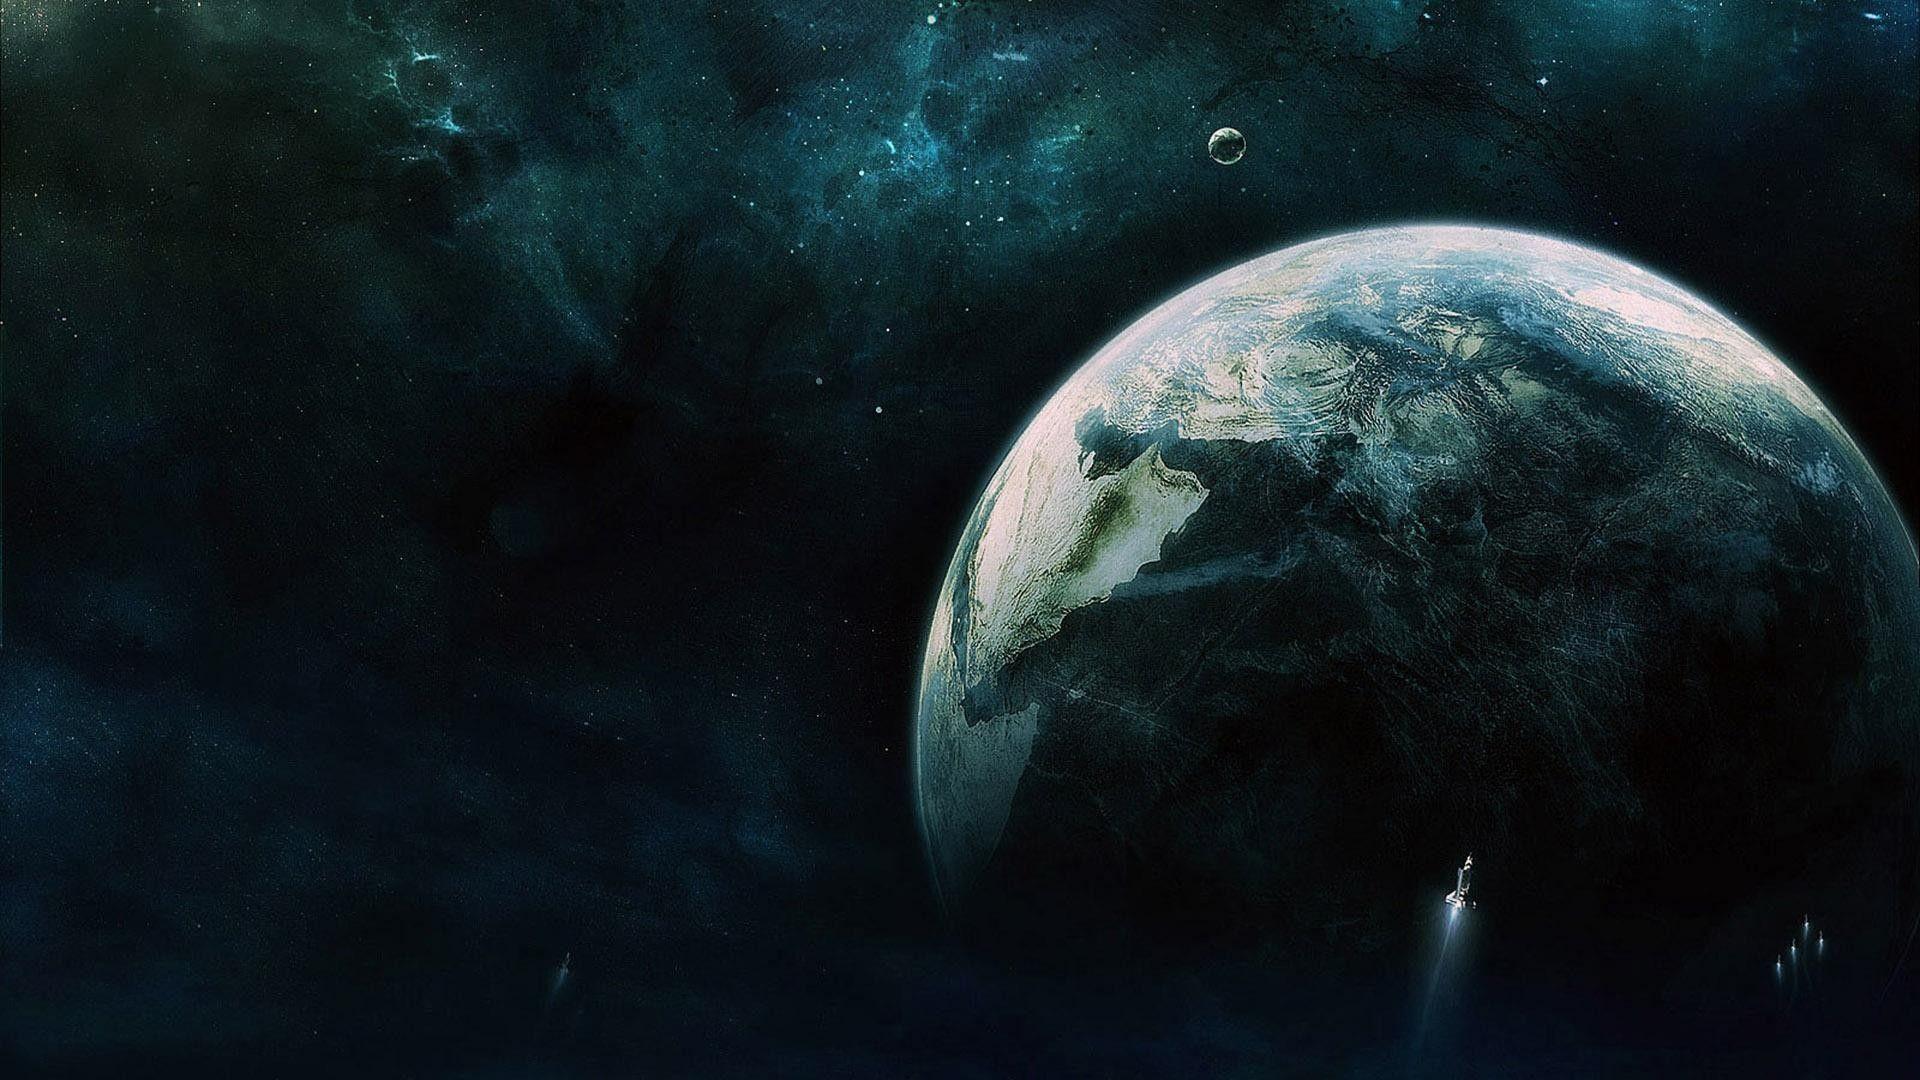 1920x1080 Epic Space Art Background Wallpaper HD